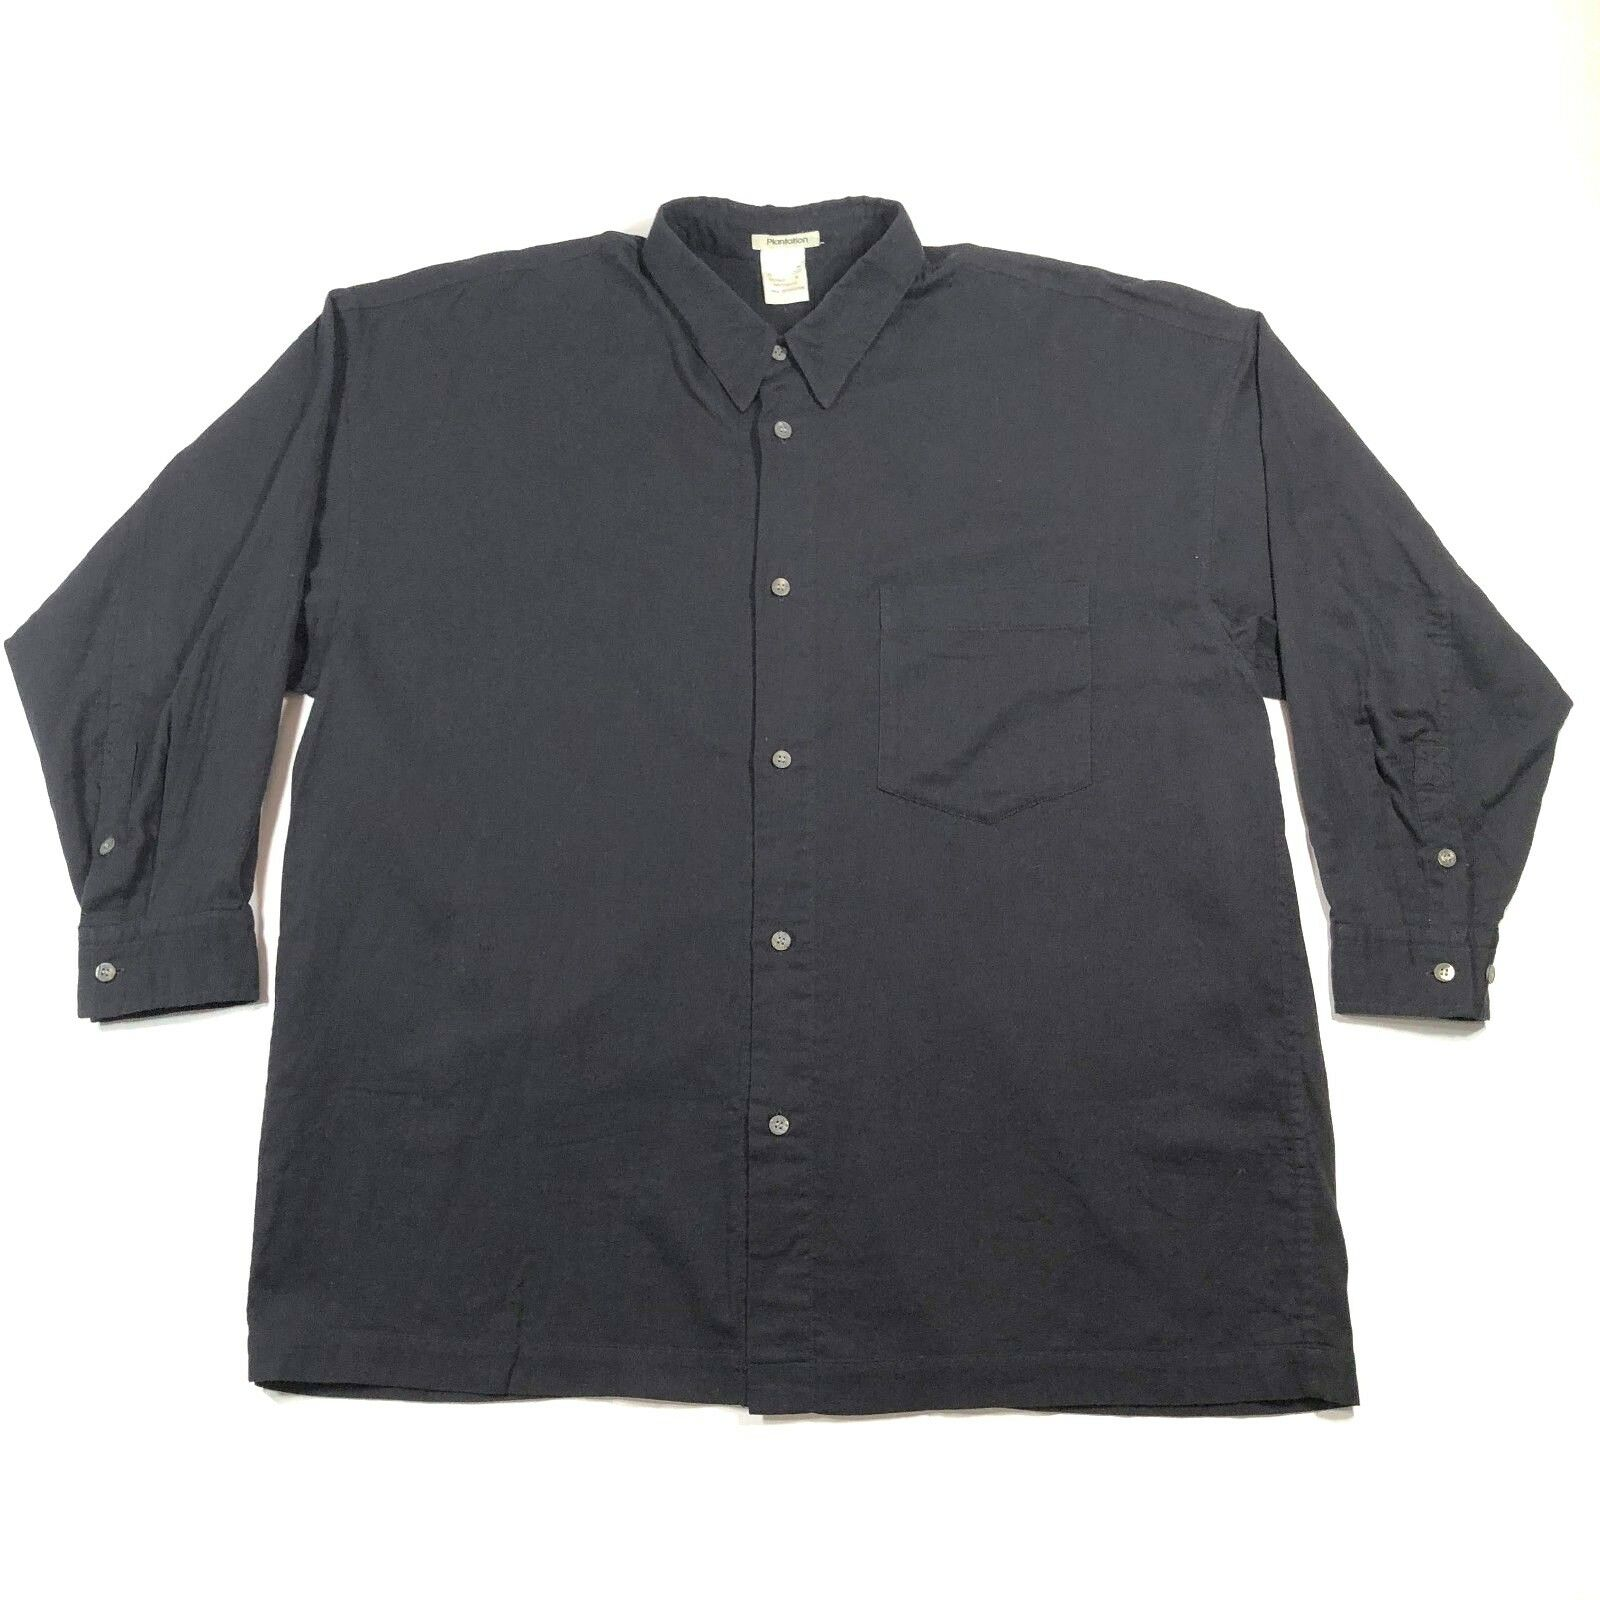 Plantation by Issey Miyake damen M Cotton Button Down Shirt Loose Fit schwarz VTG